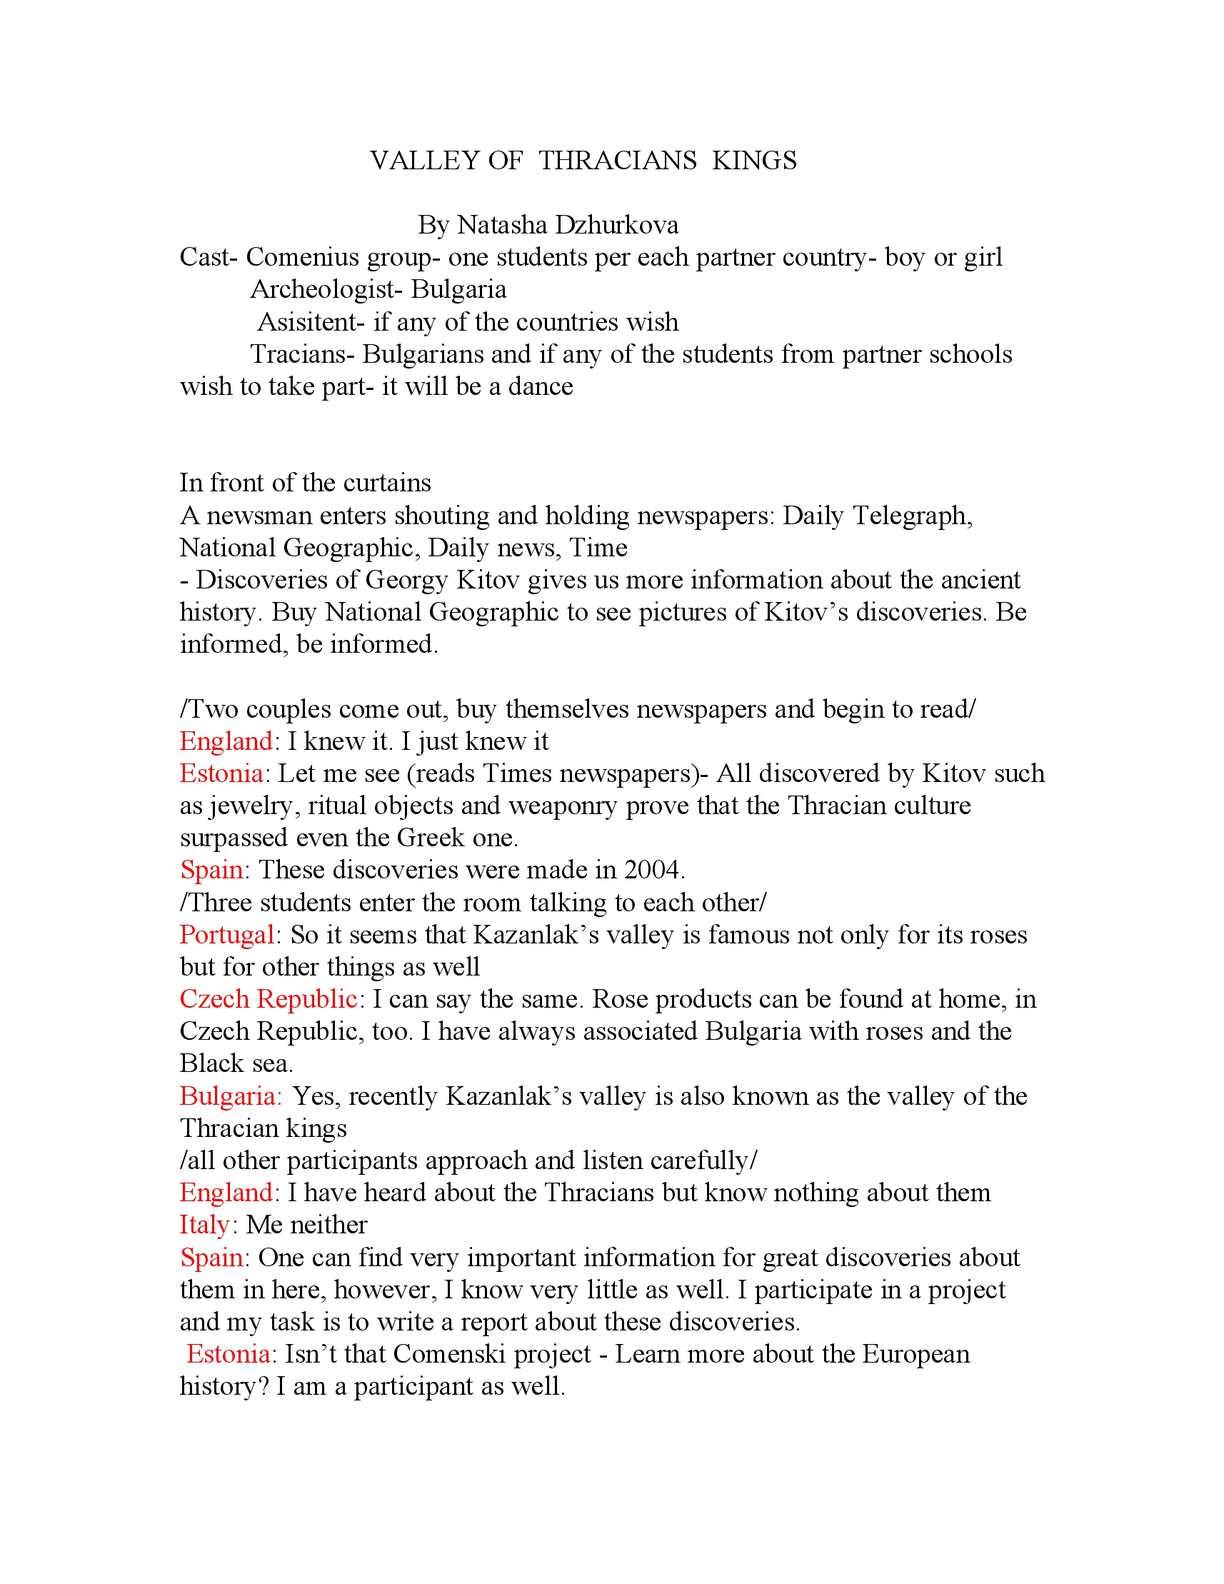 Calaméo - script for the Bulgarian local historical event